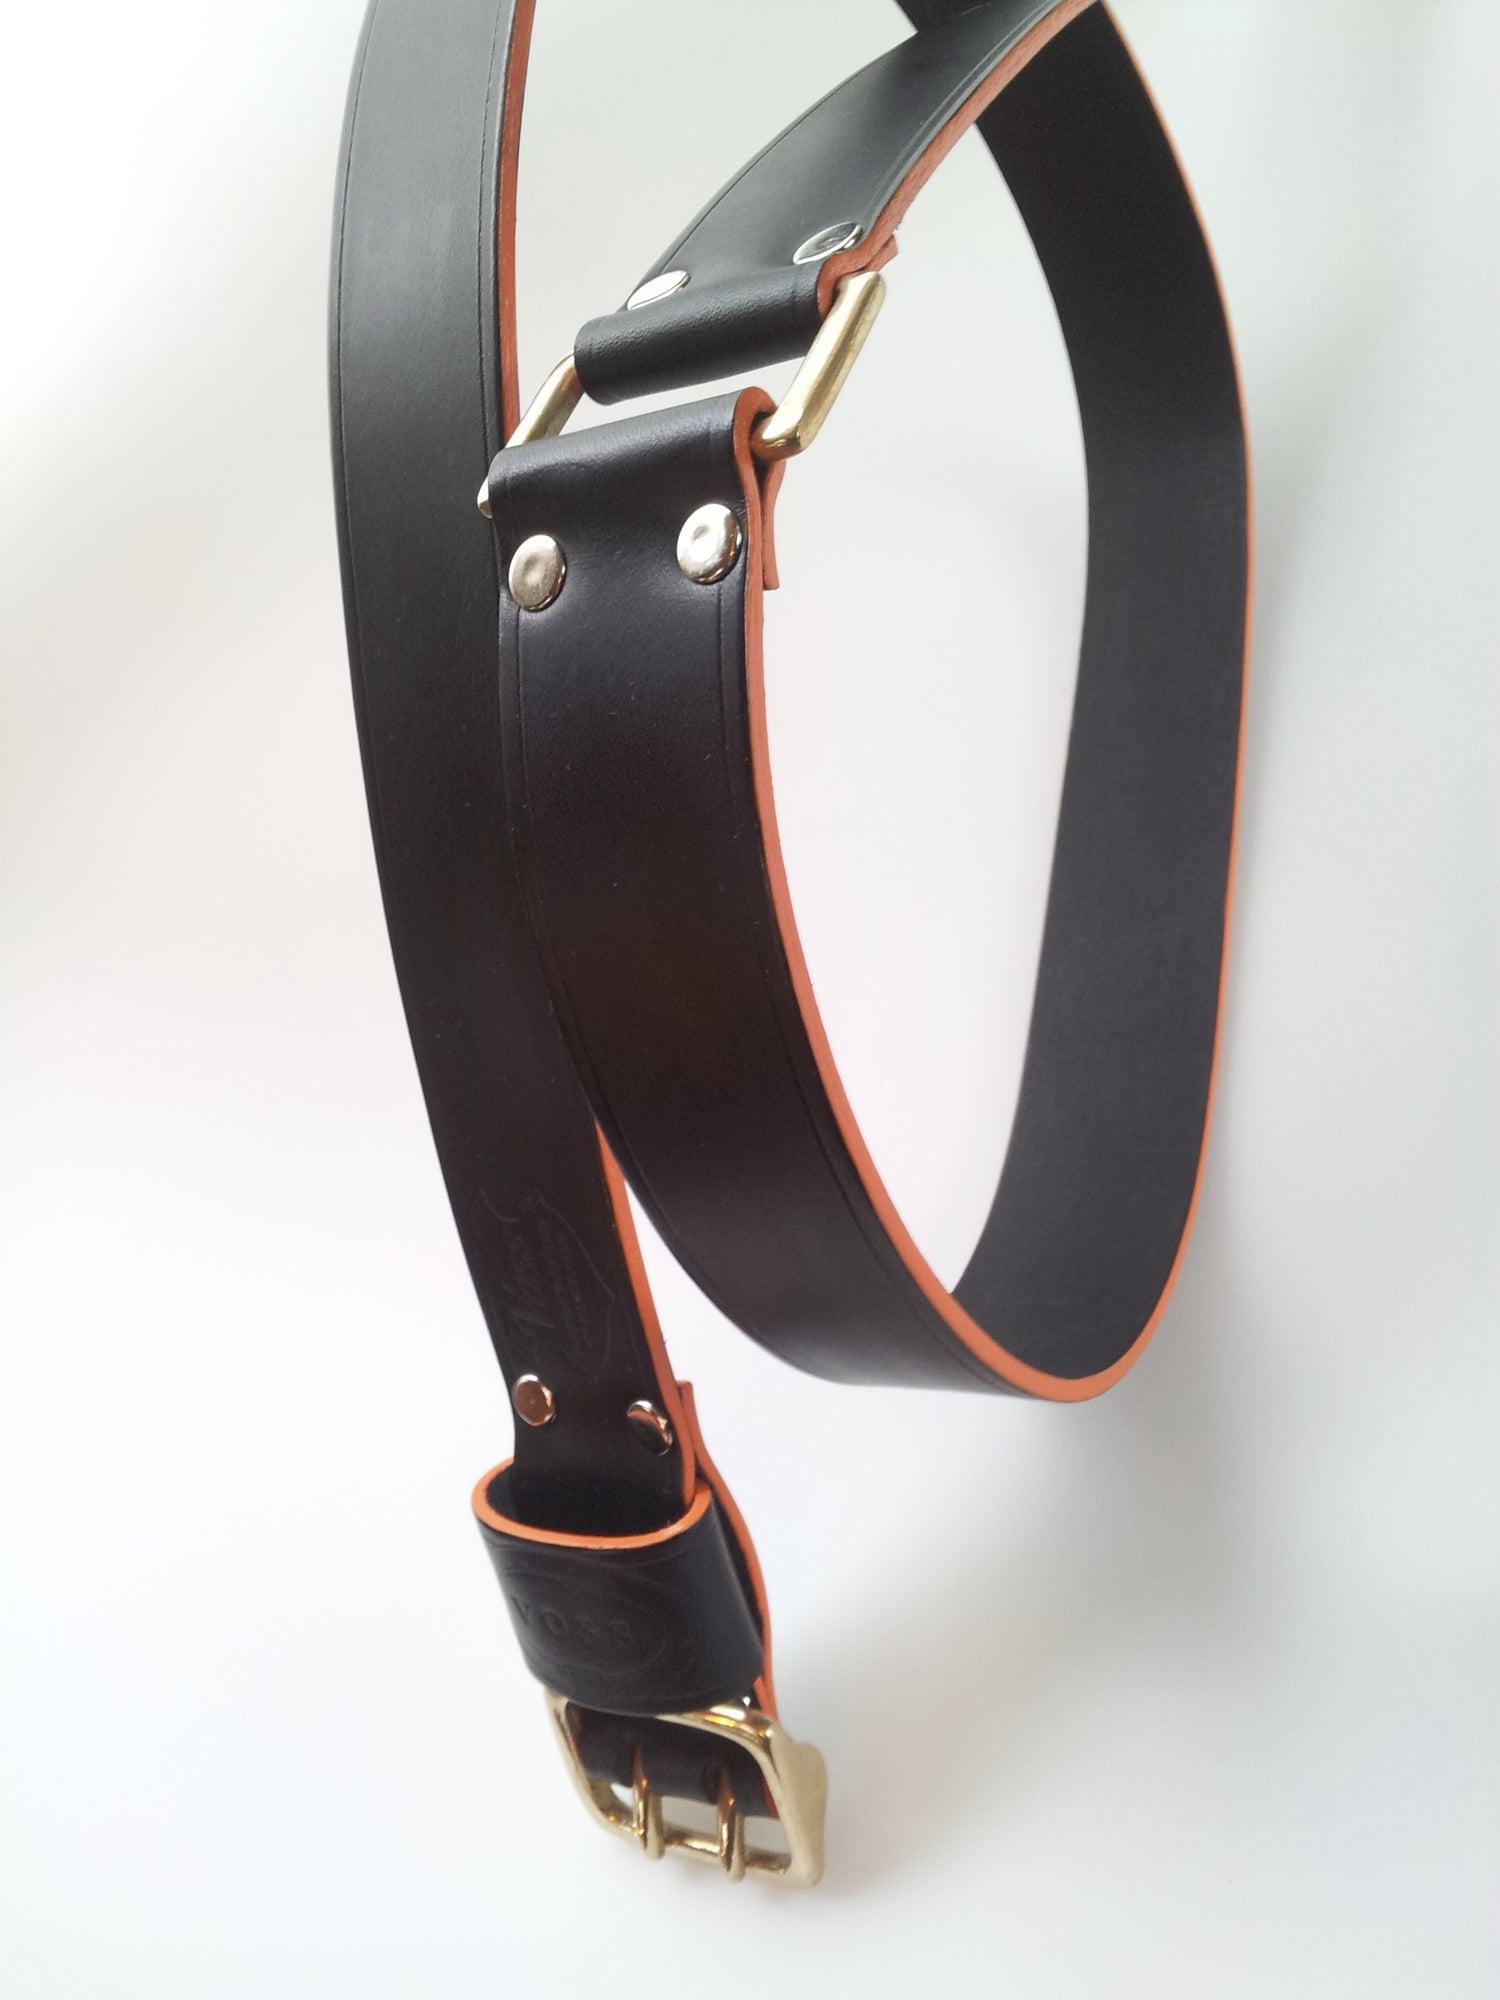 Image of Count / Black + Ob-Ext / Orange Edge